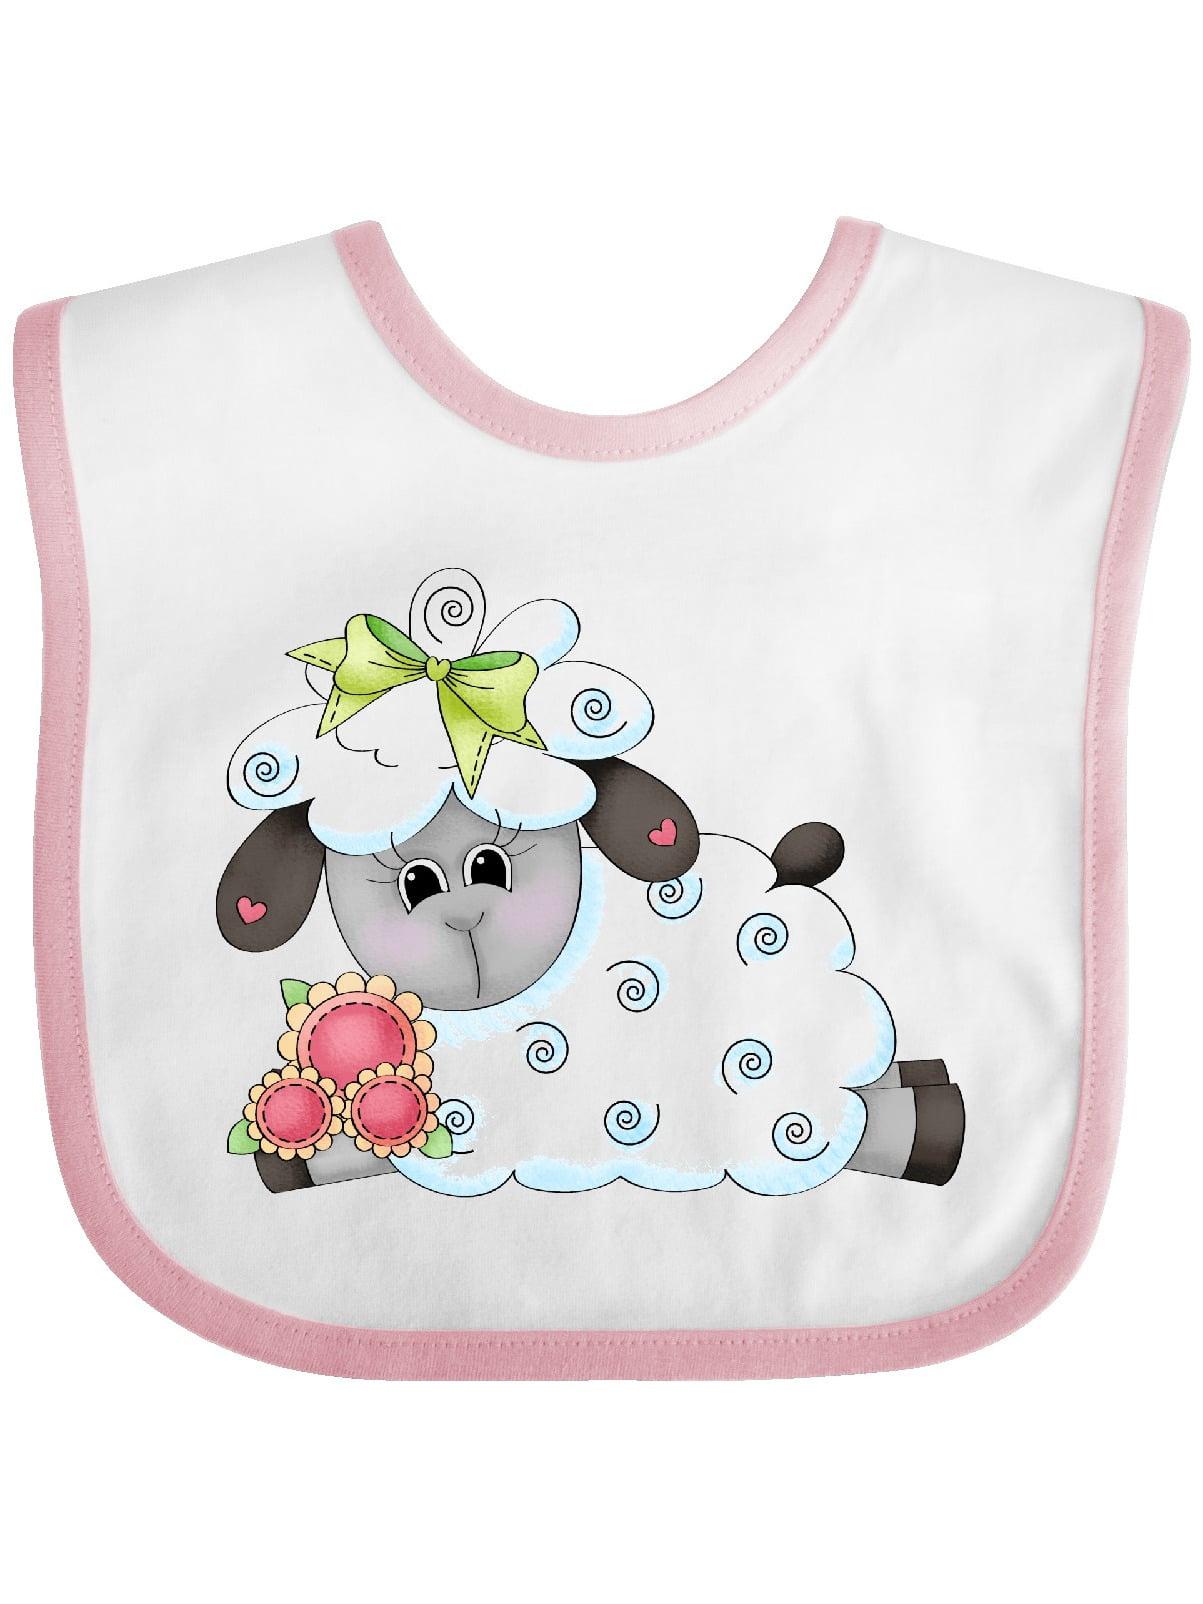 Little Bow Sheep Baby Bib - Walmart.com - Walmart.com